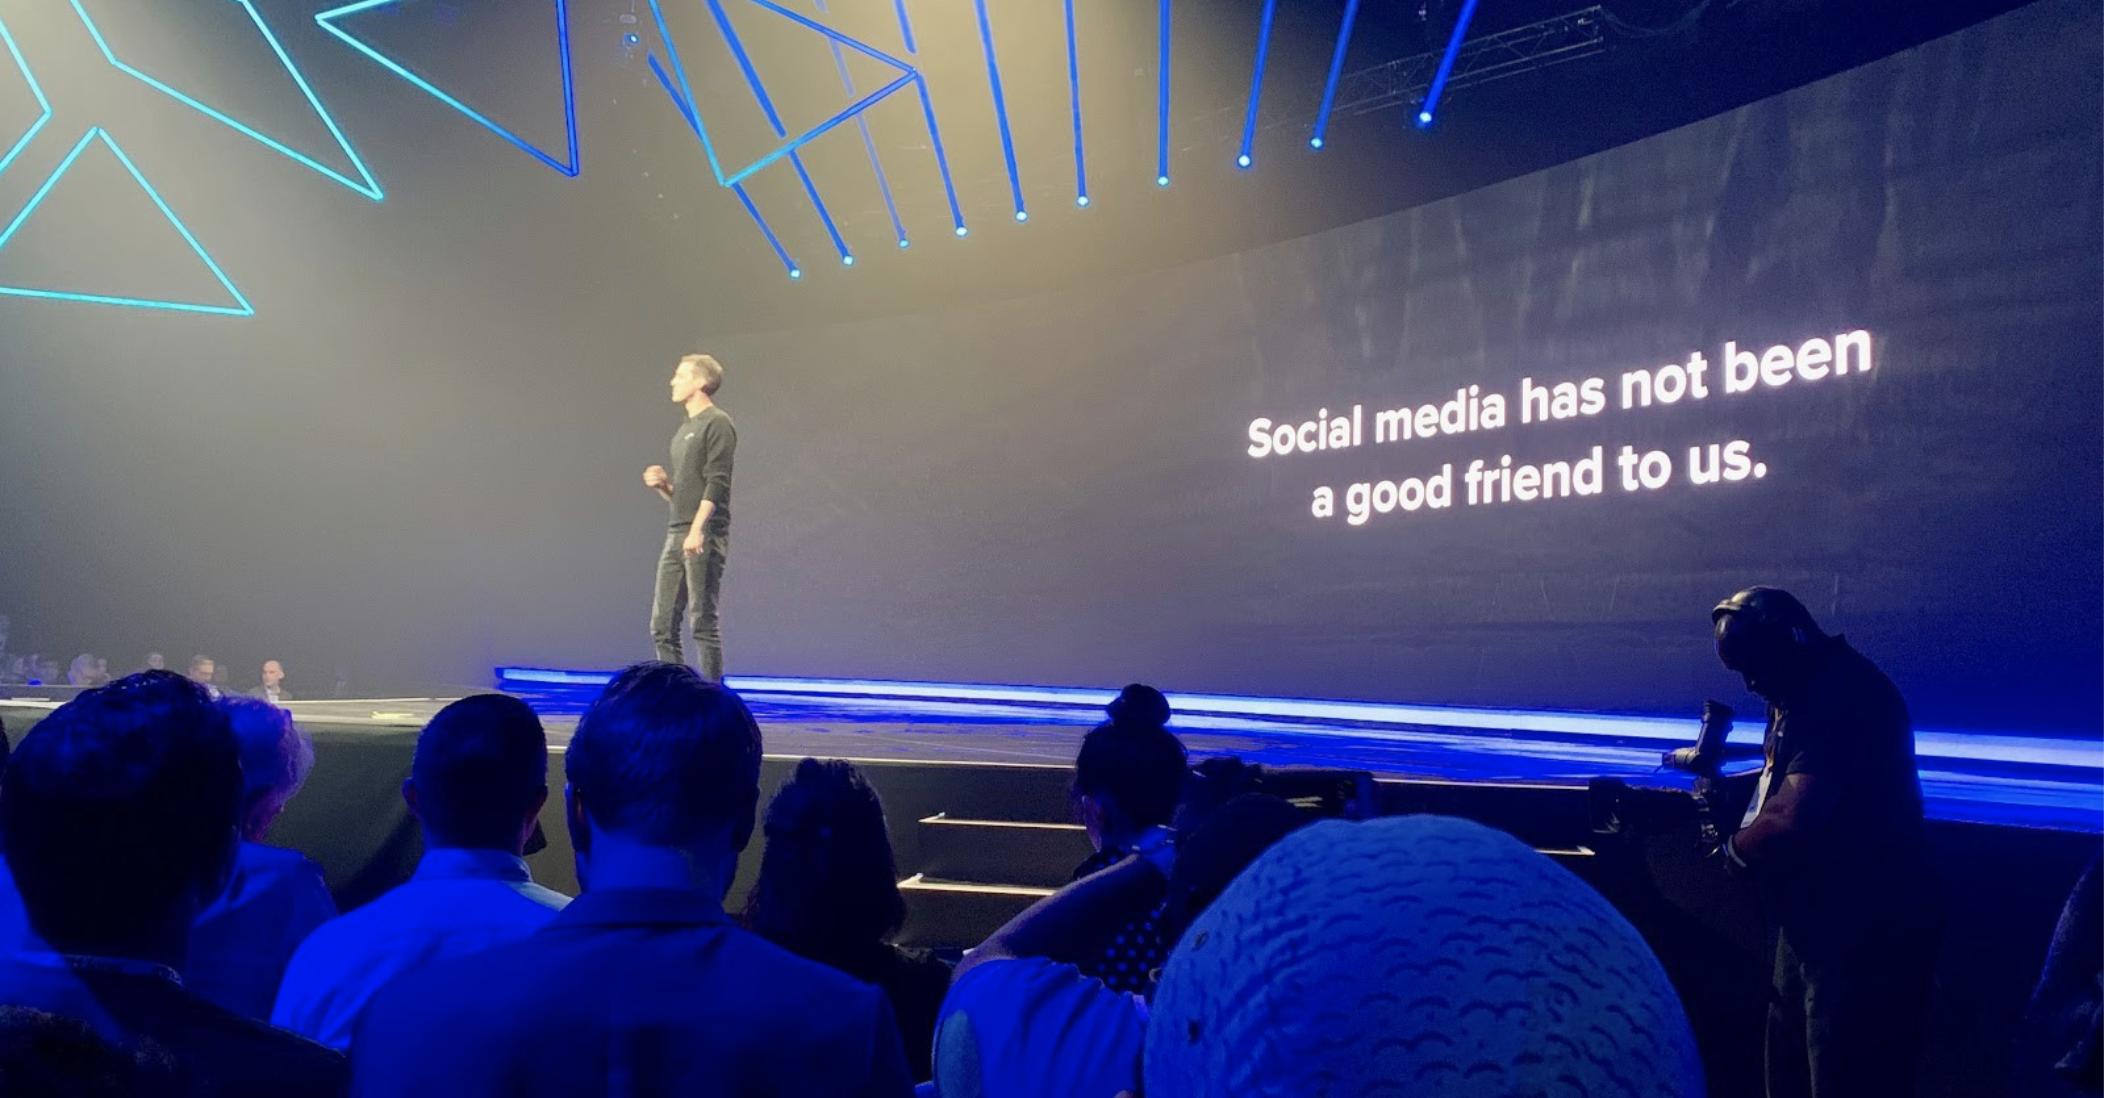 Blockone Launches Social Media App on EOS blockchain